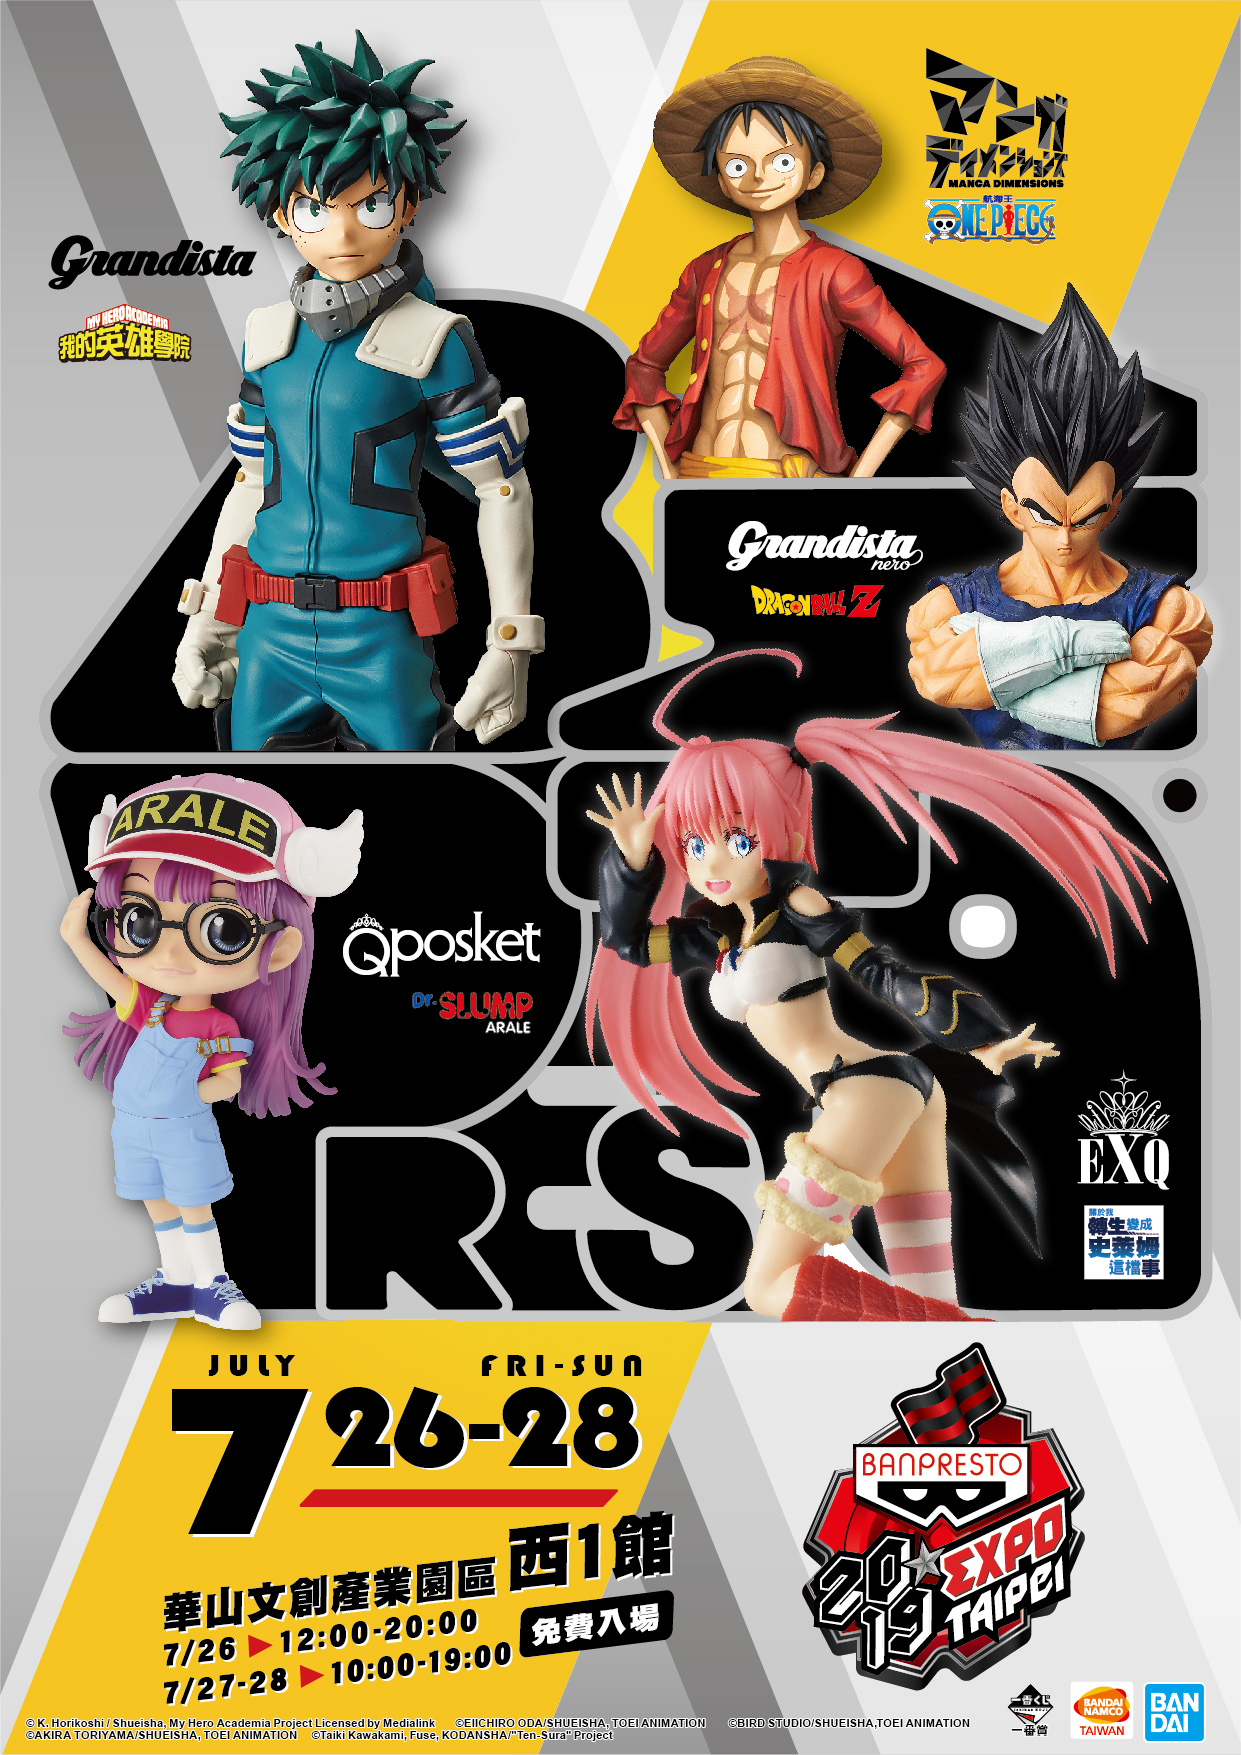 「BANPRESTO EXPO 2019」大型模型展,7/26 ~ 7/28 免費入場